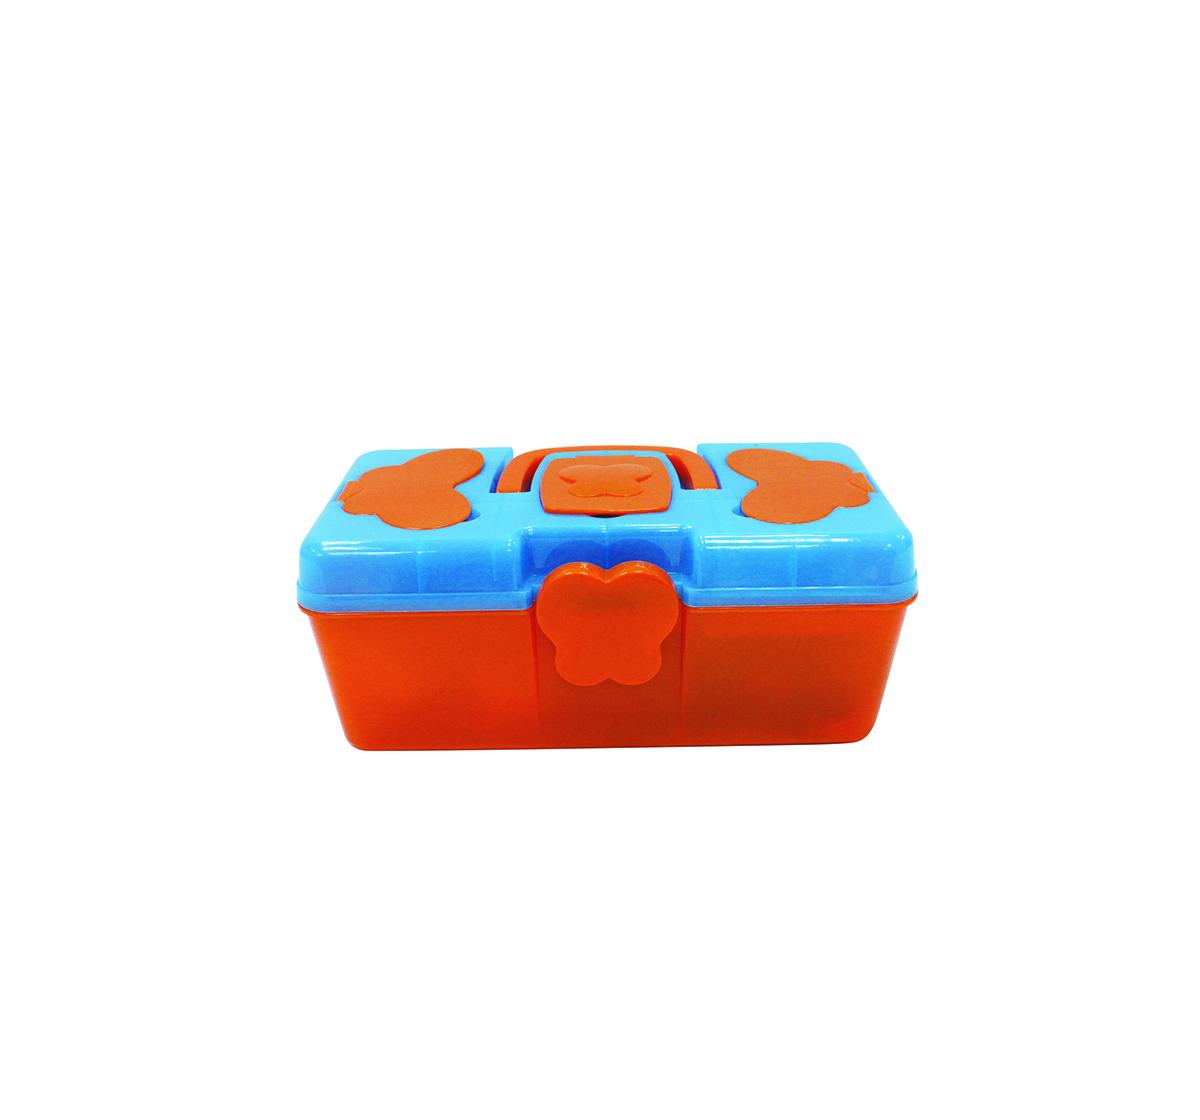 Youreka | Youreka Craft Box Set 1000 Pcs DIY Art & Craft Kits for Kids age 3Y+